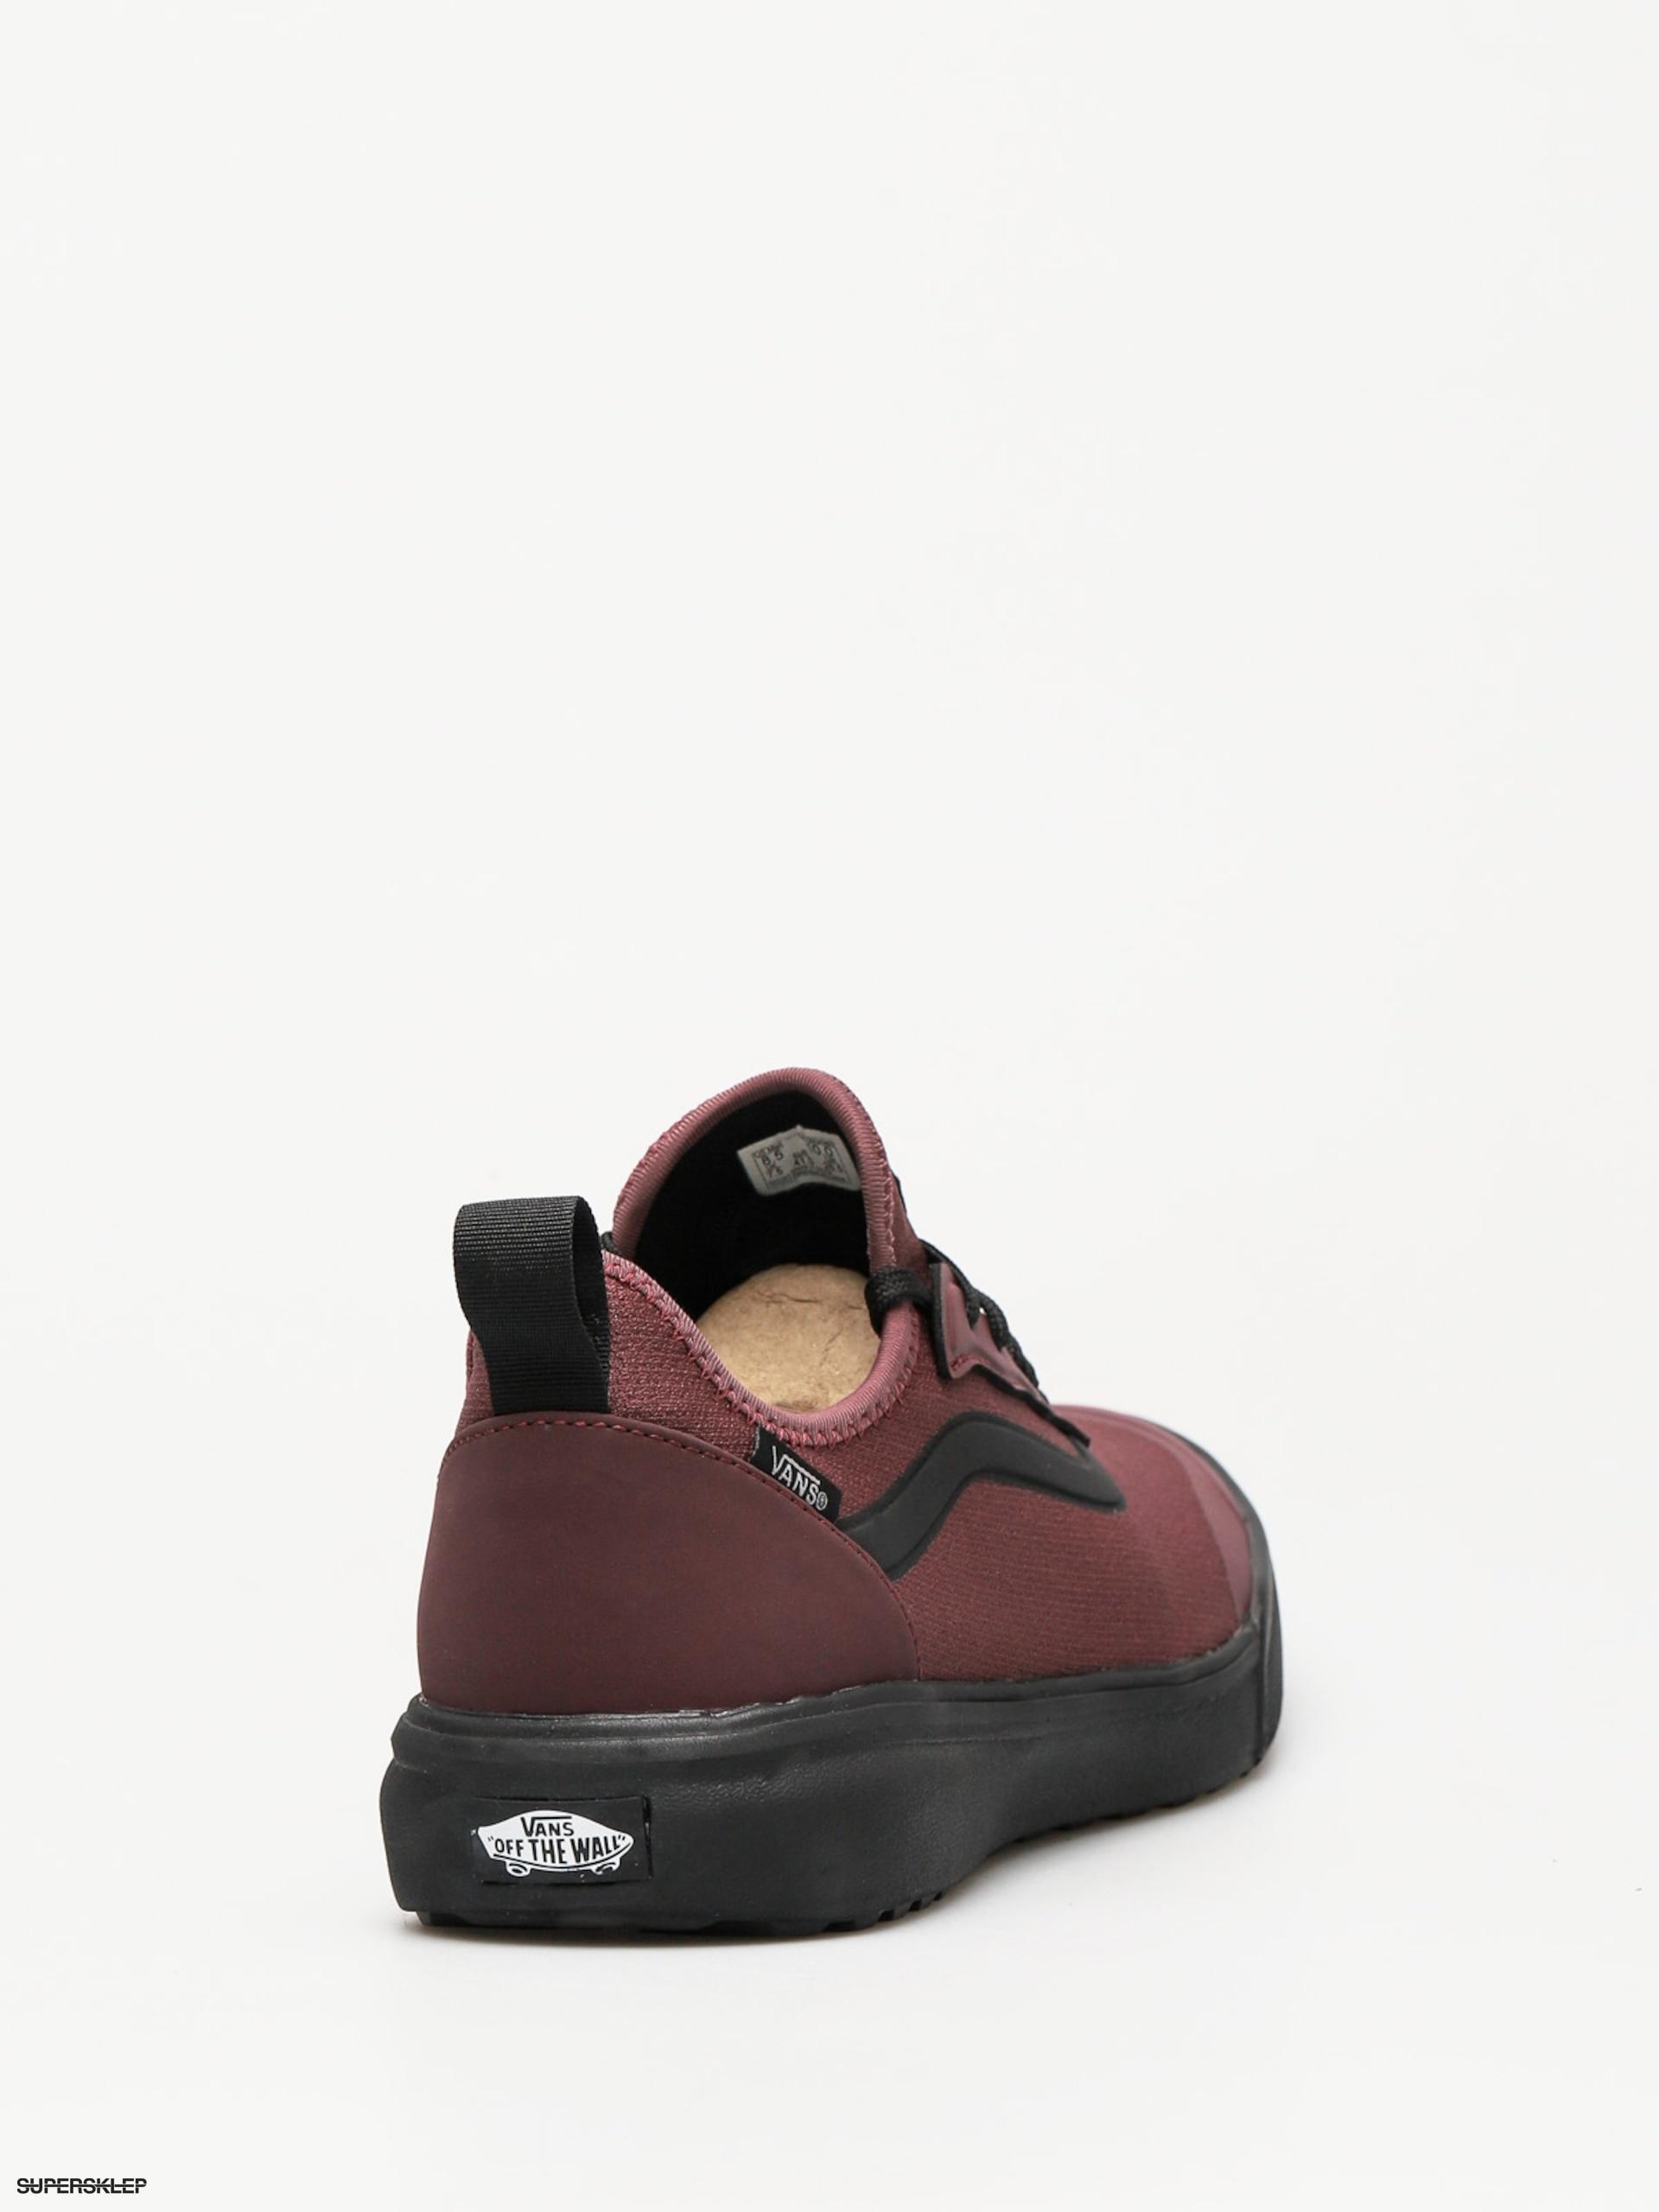 89a337ad878a80 Buty Vans Ultrarange Ac (catawba grape black)